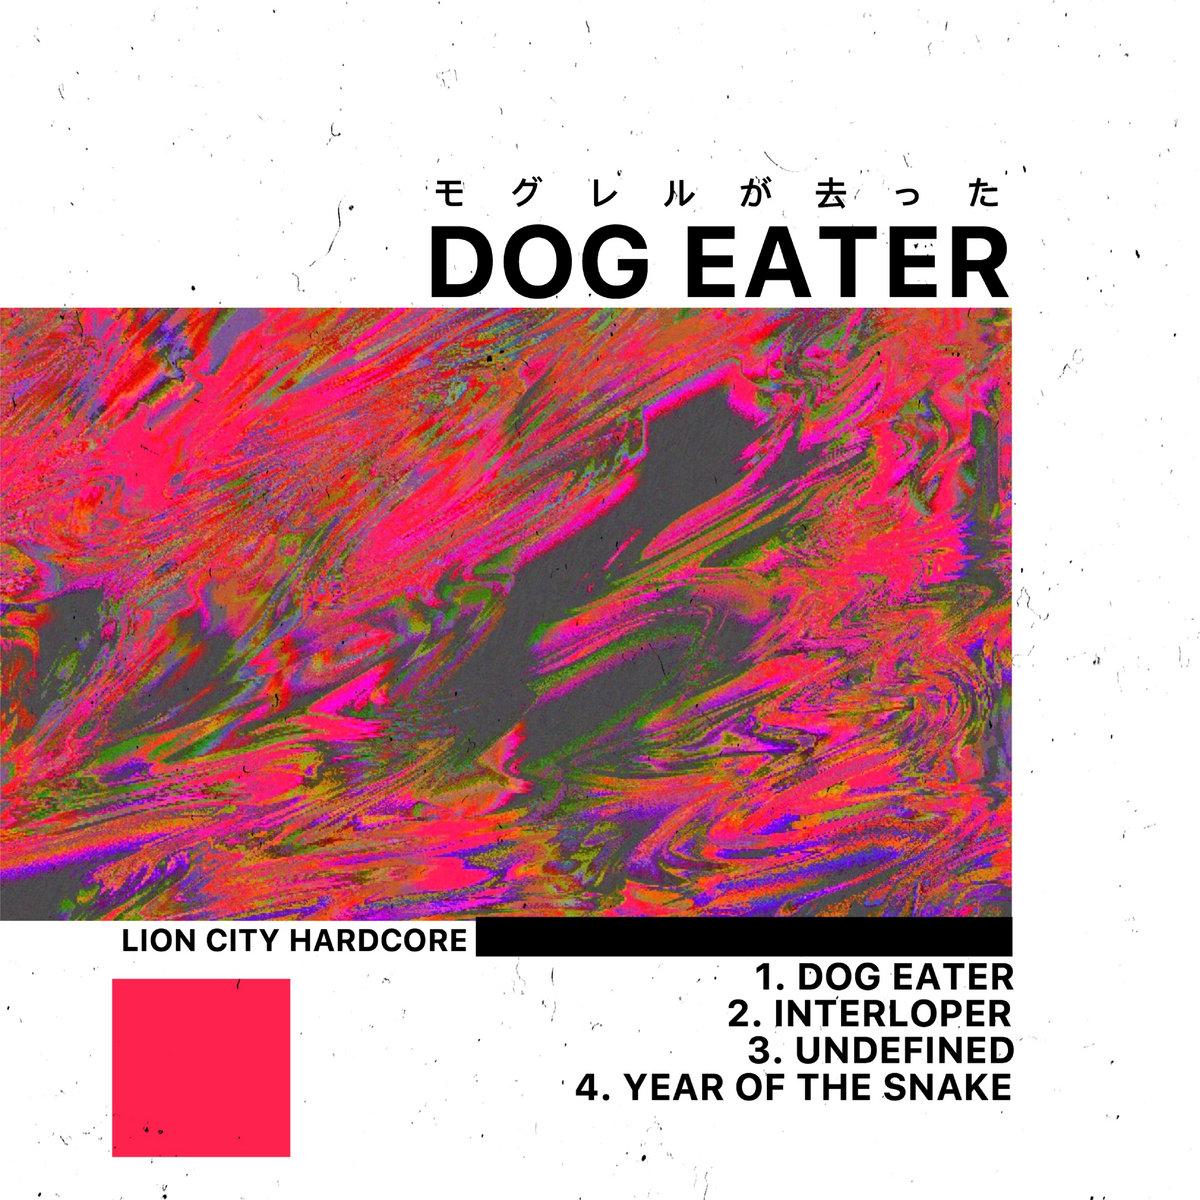 Dog Eater - Self-titled